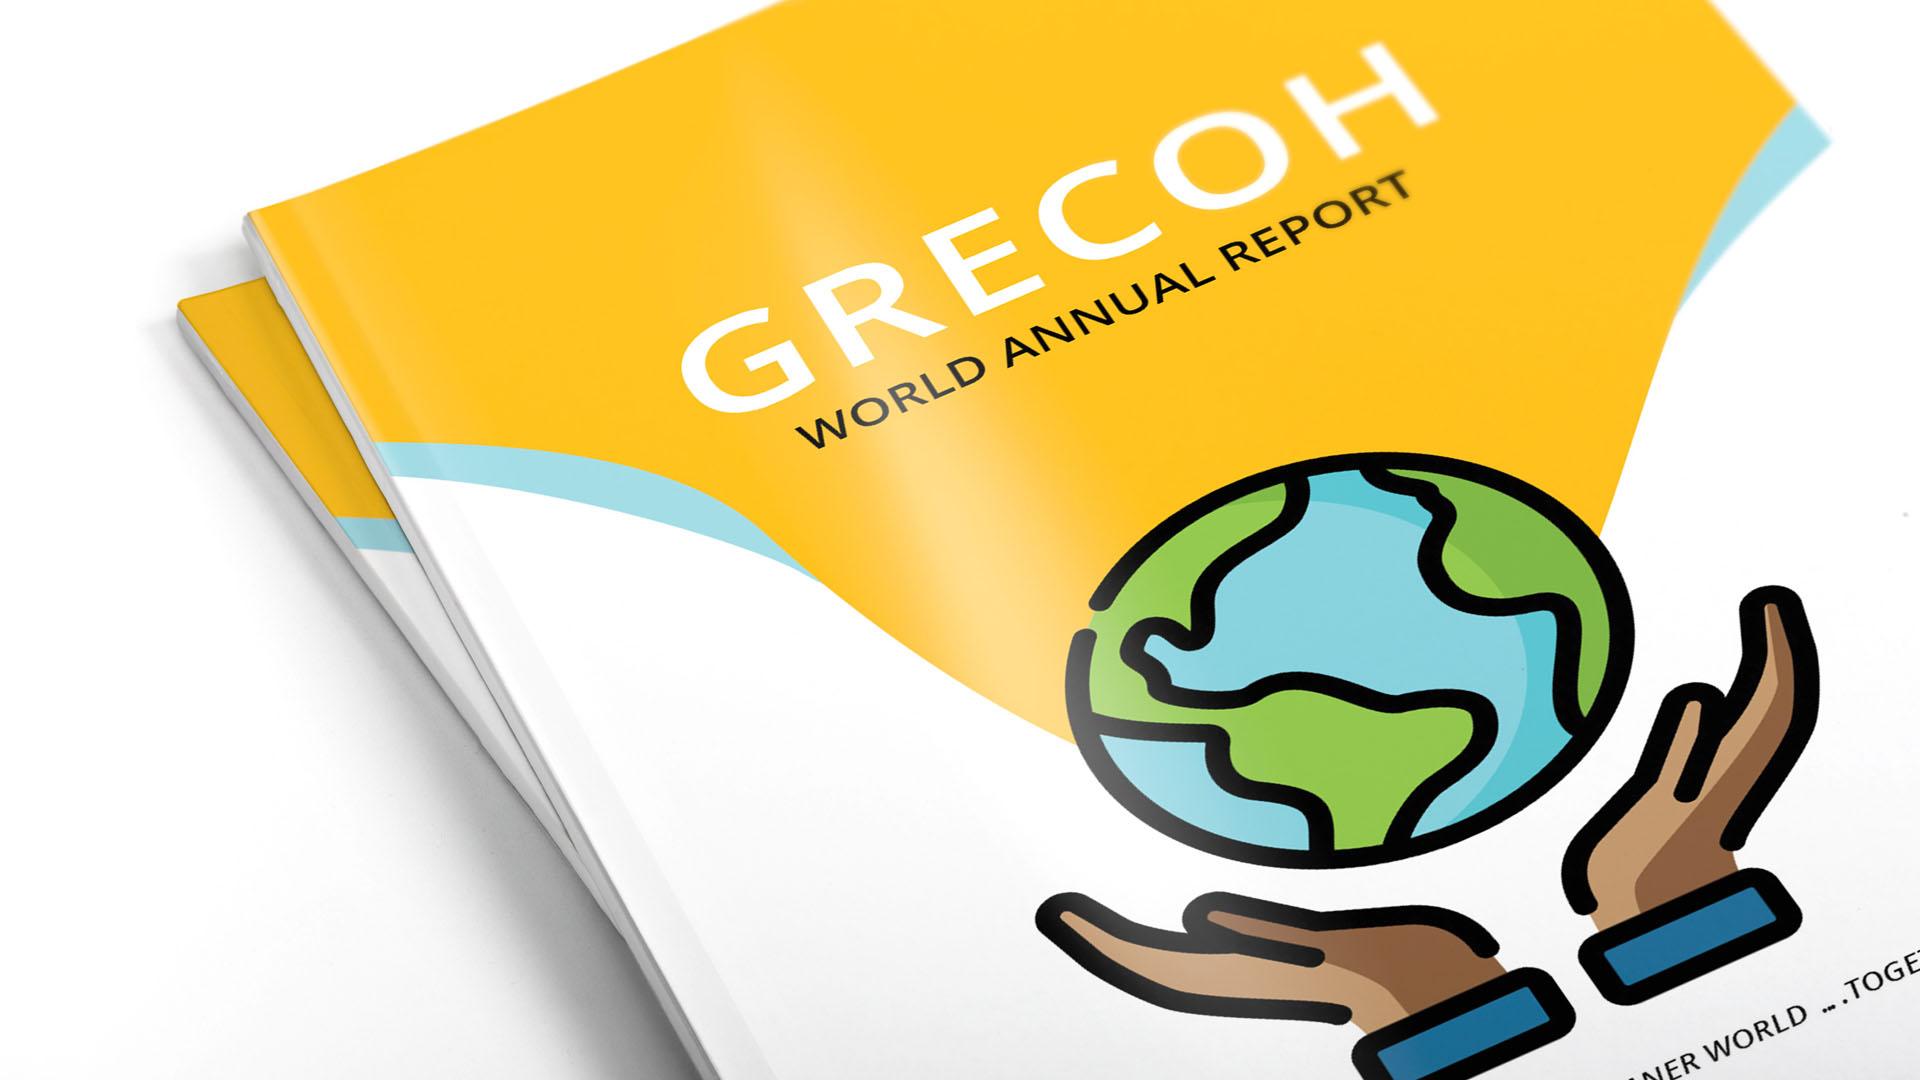 Grecoh - Deigned by Jabari Creative Studios